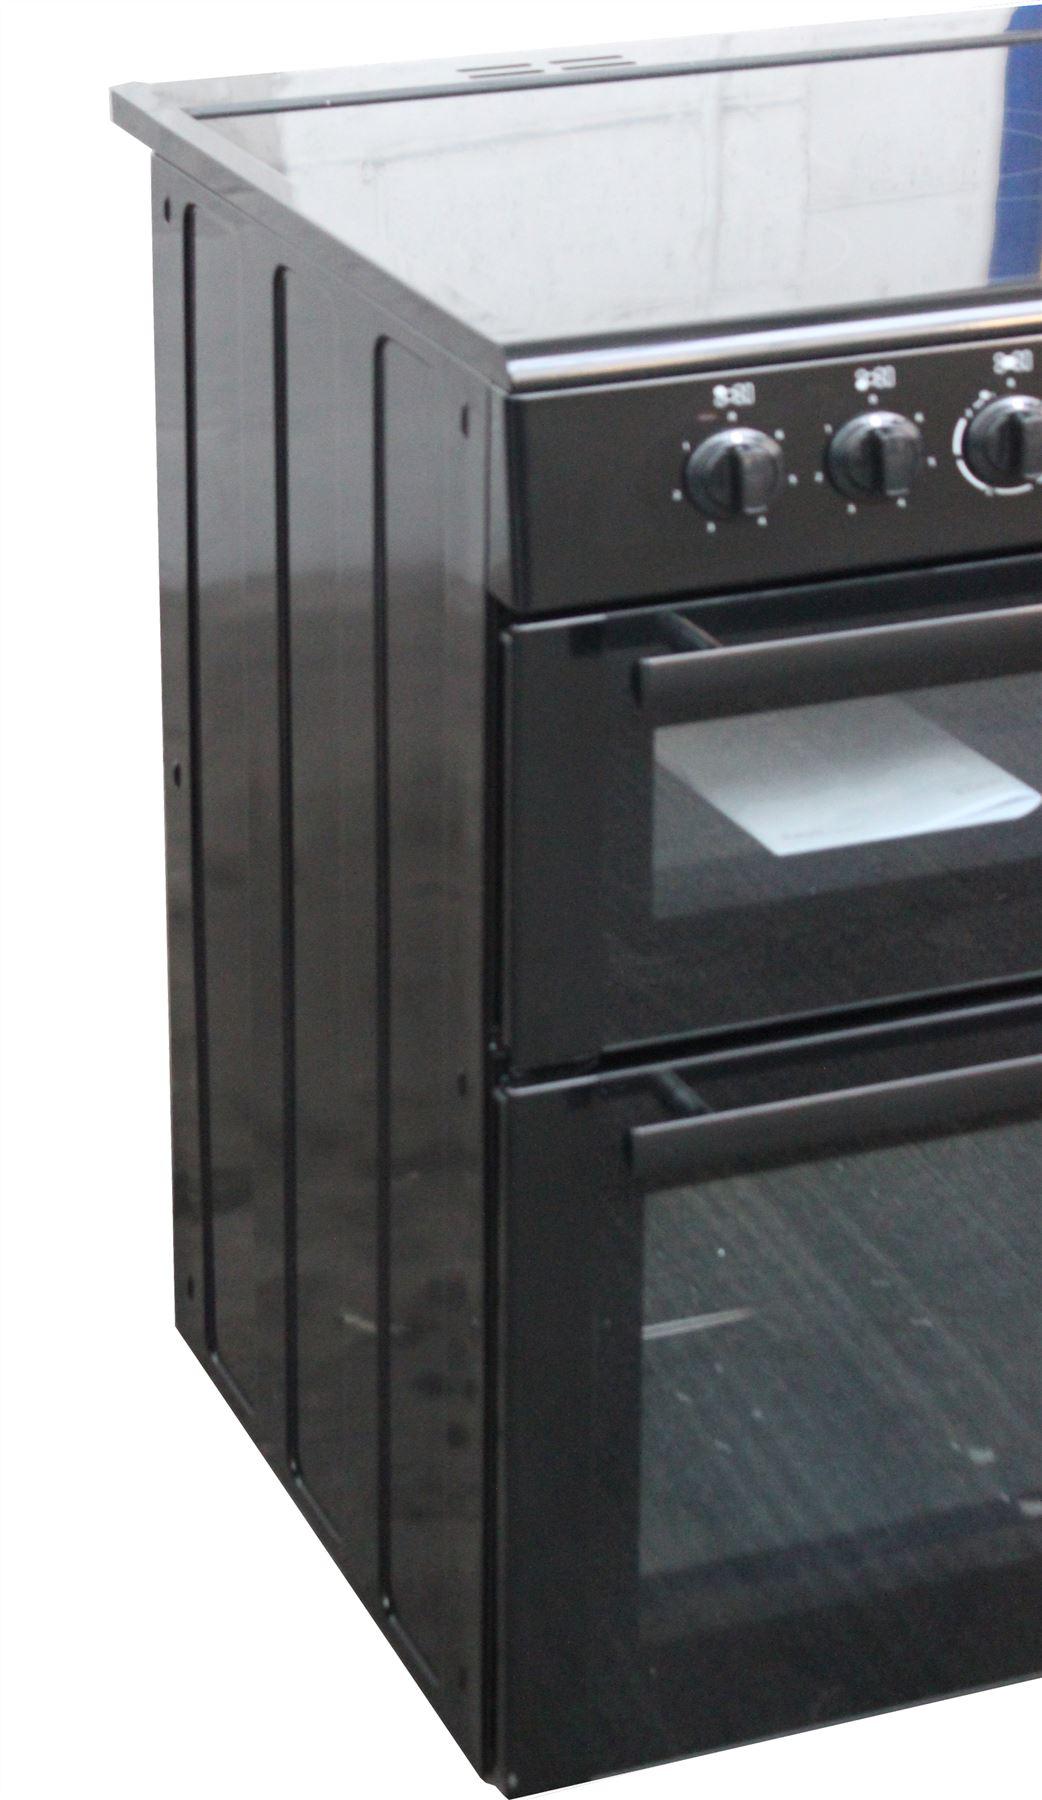 Double Double 100cm : Beko cm electric range cooker bdvc k ceramic hob